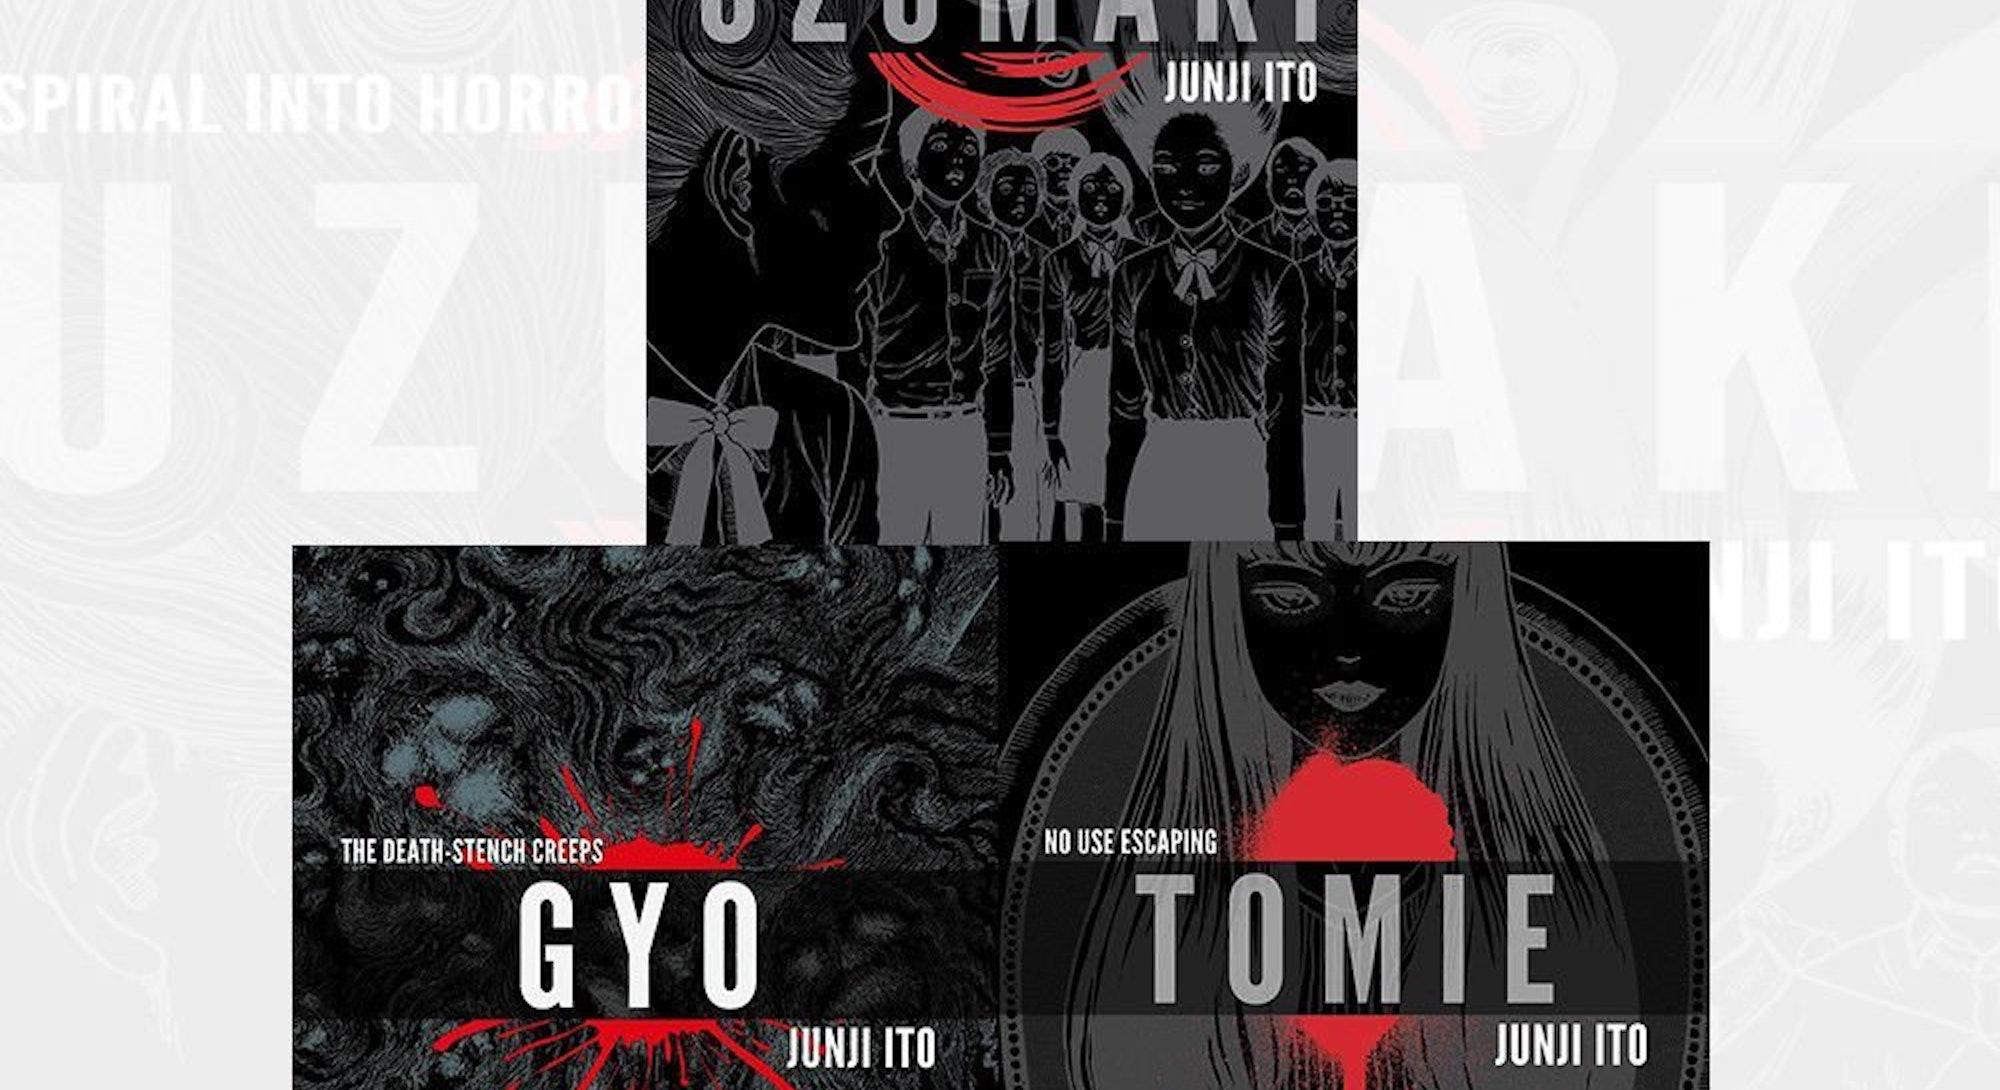 Three classic Junji Ito works.